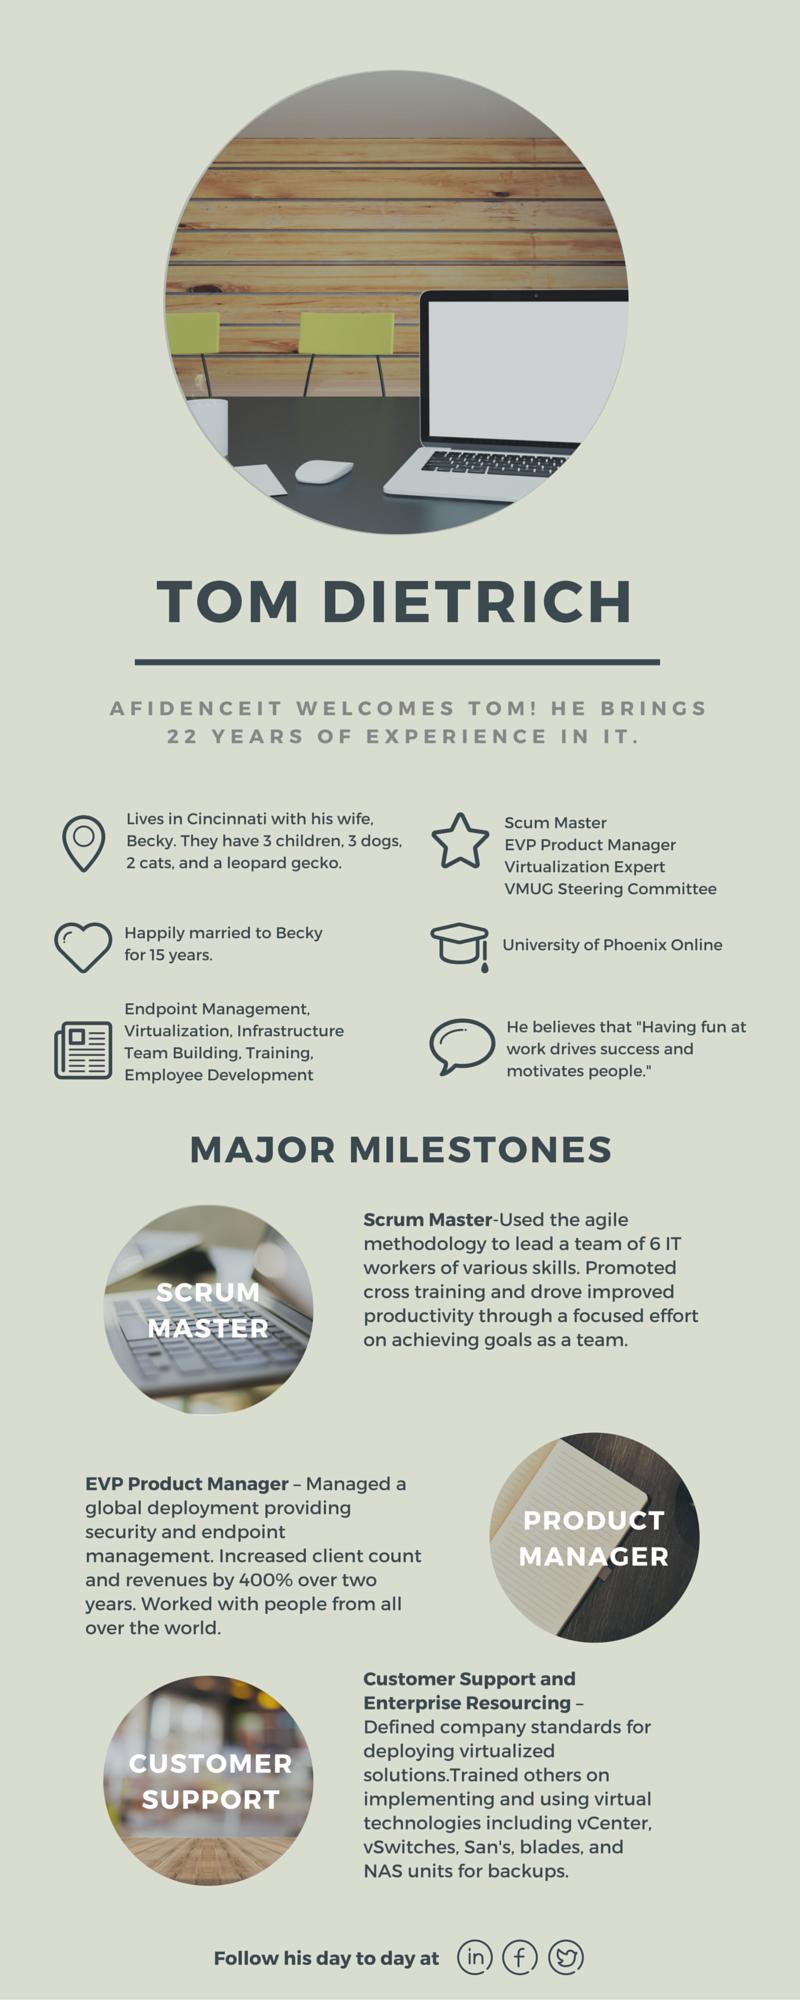 Meet Tom Dietrich